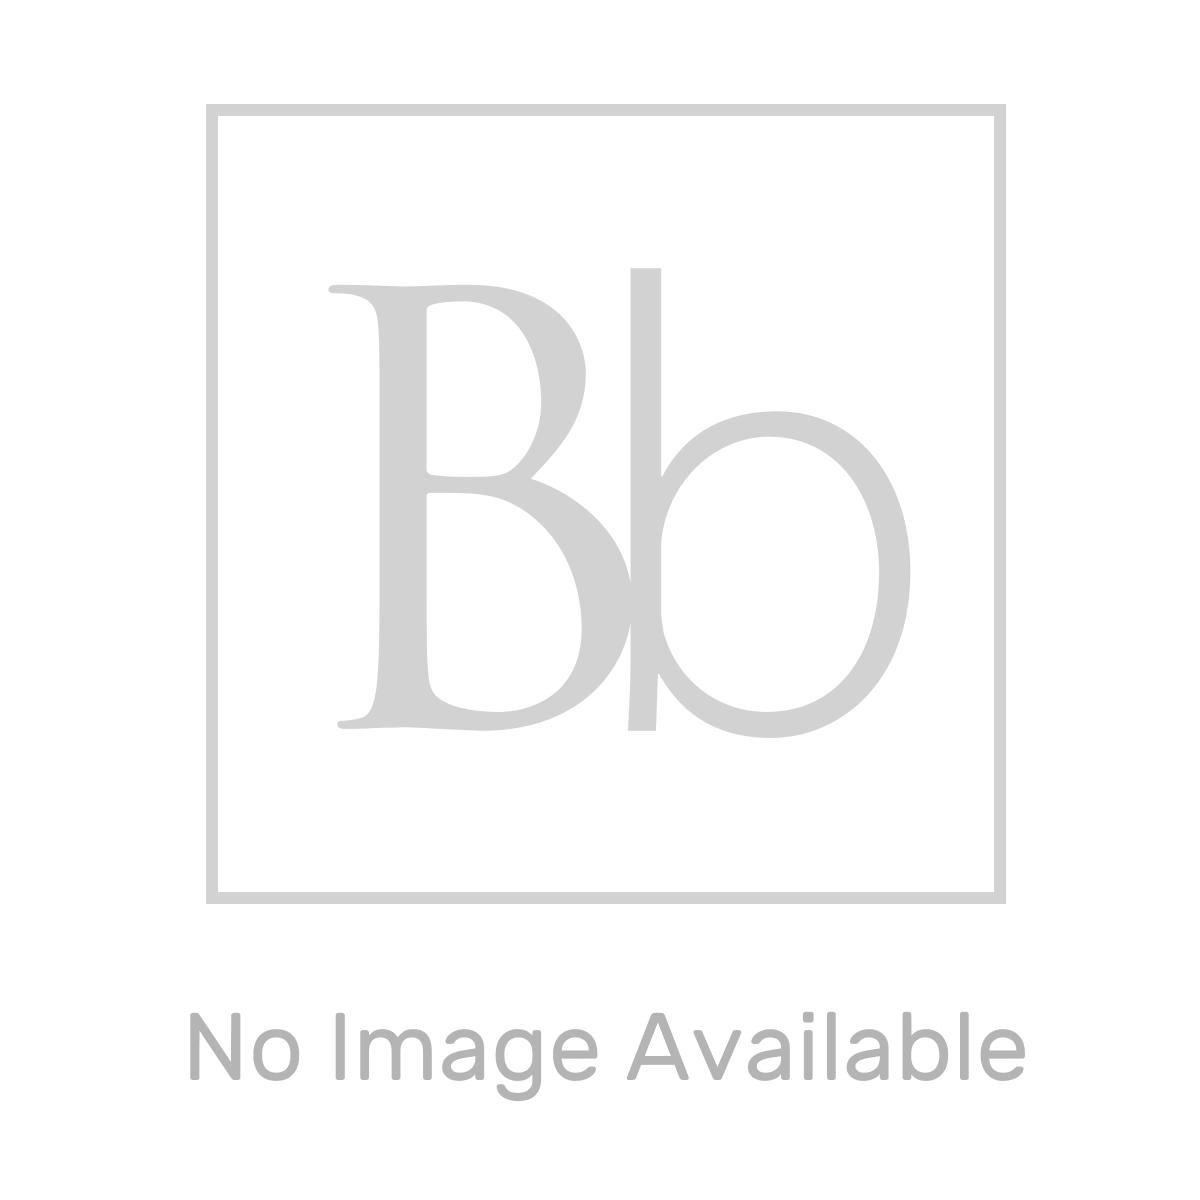 Mito Wall Hung Vanity Unit 600mm Lifestyle